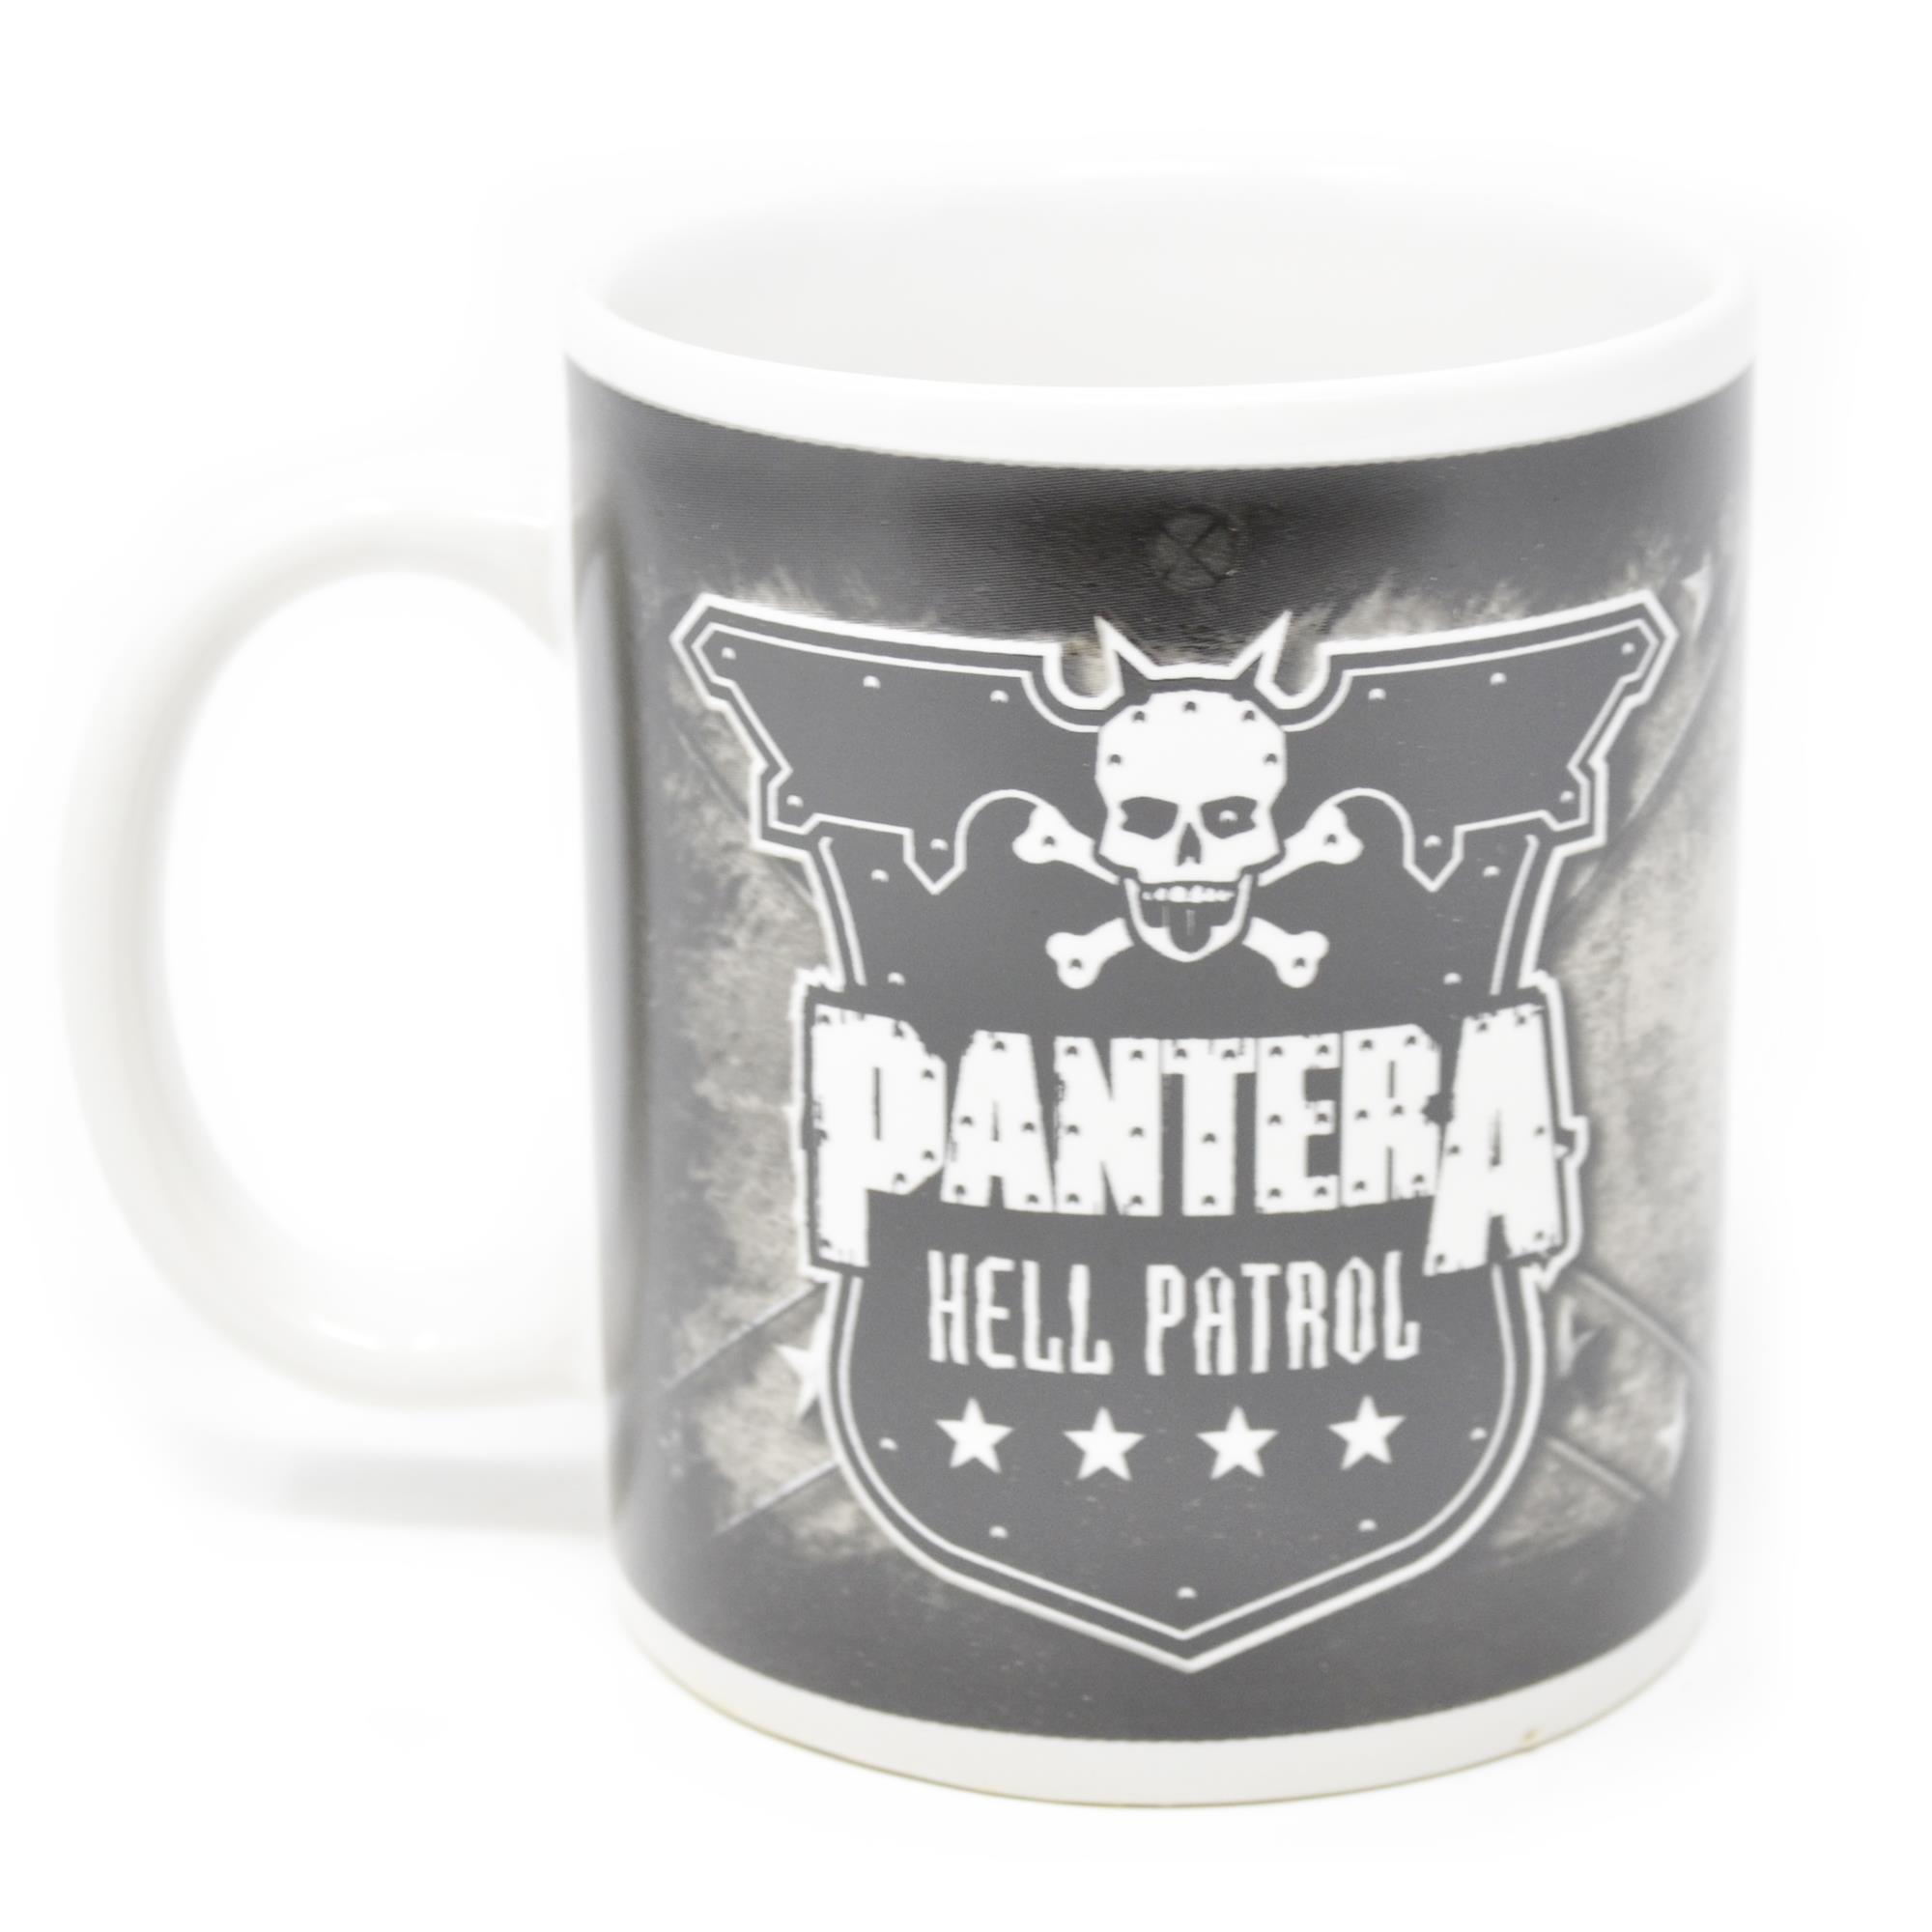 Hell Patrol